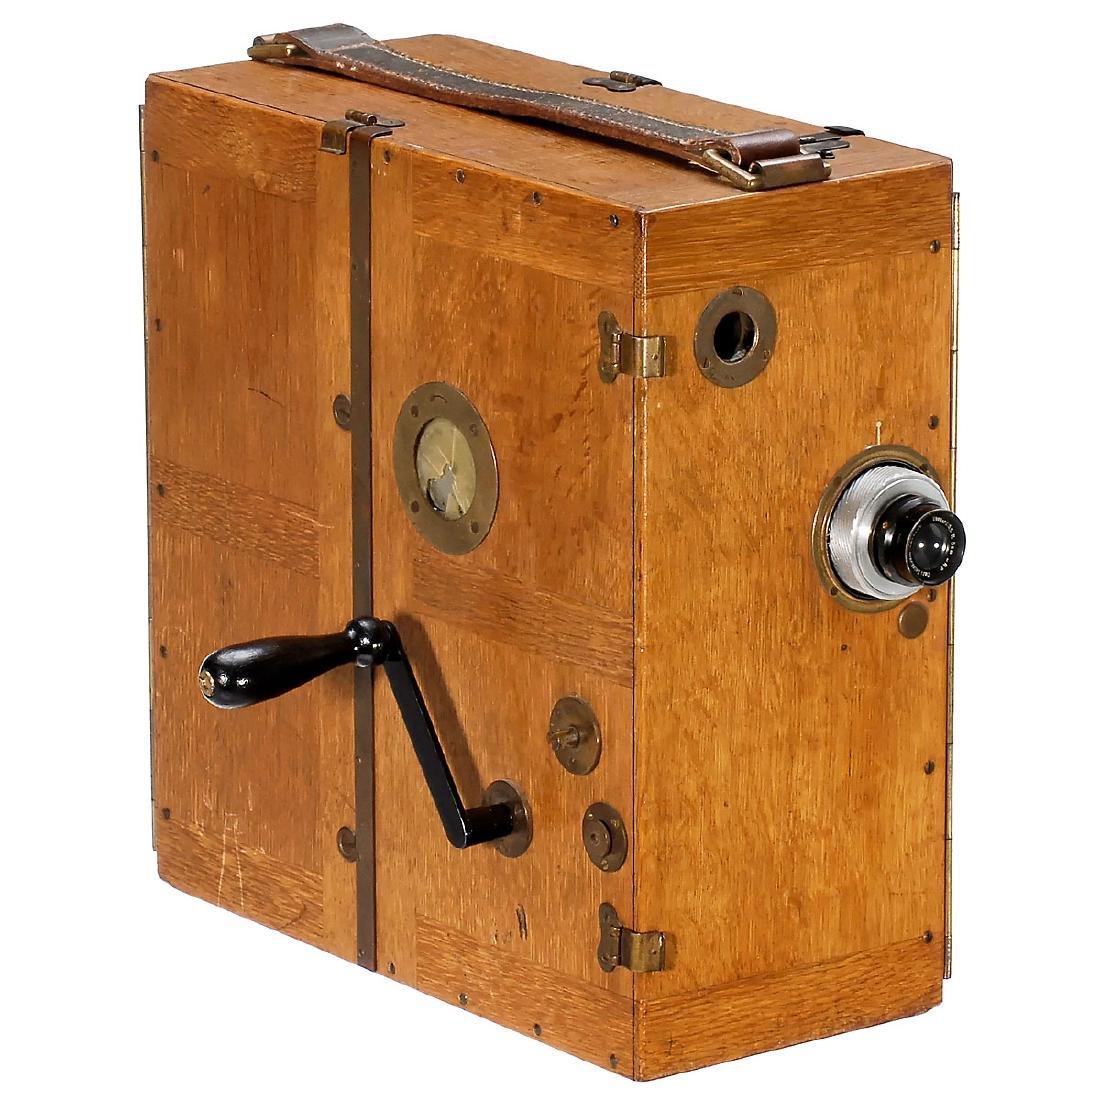 Zeiss Ikon Kino-A 35mm Movie Camera, c. 1932